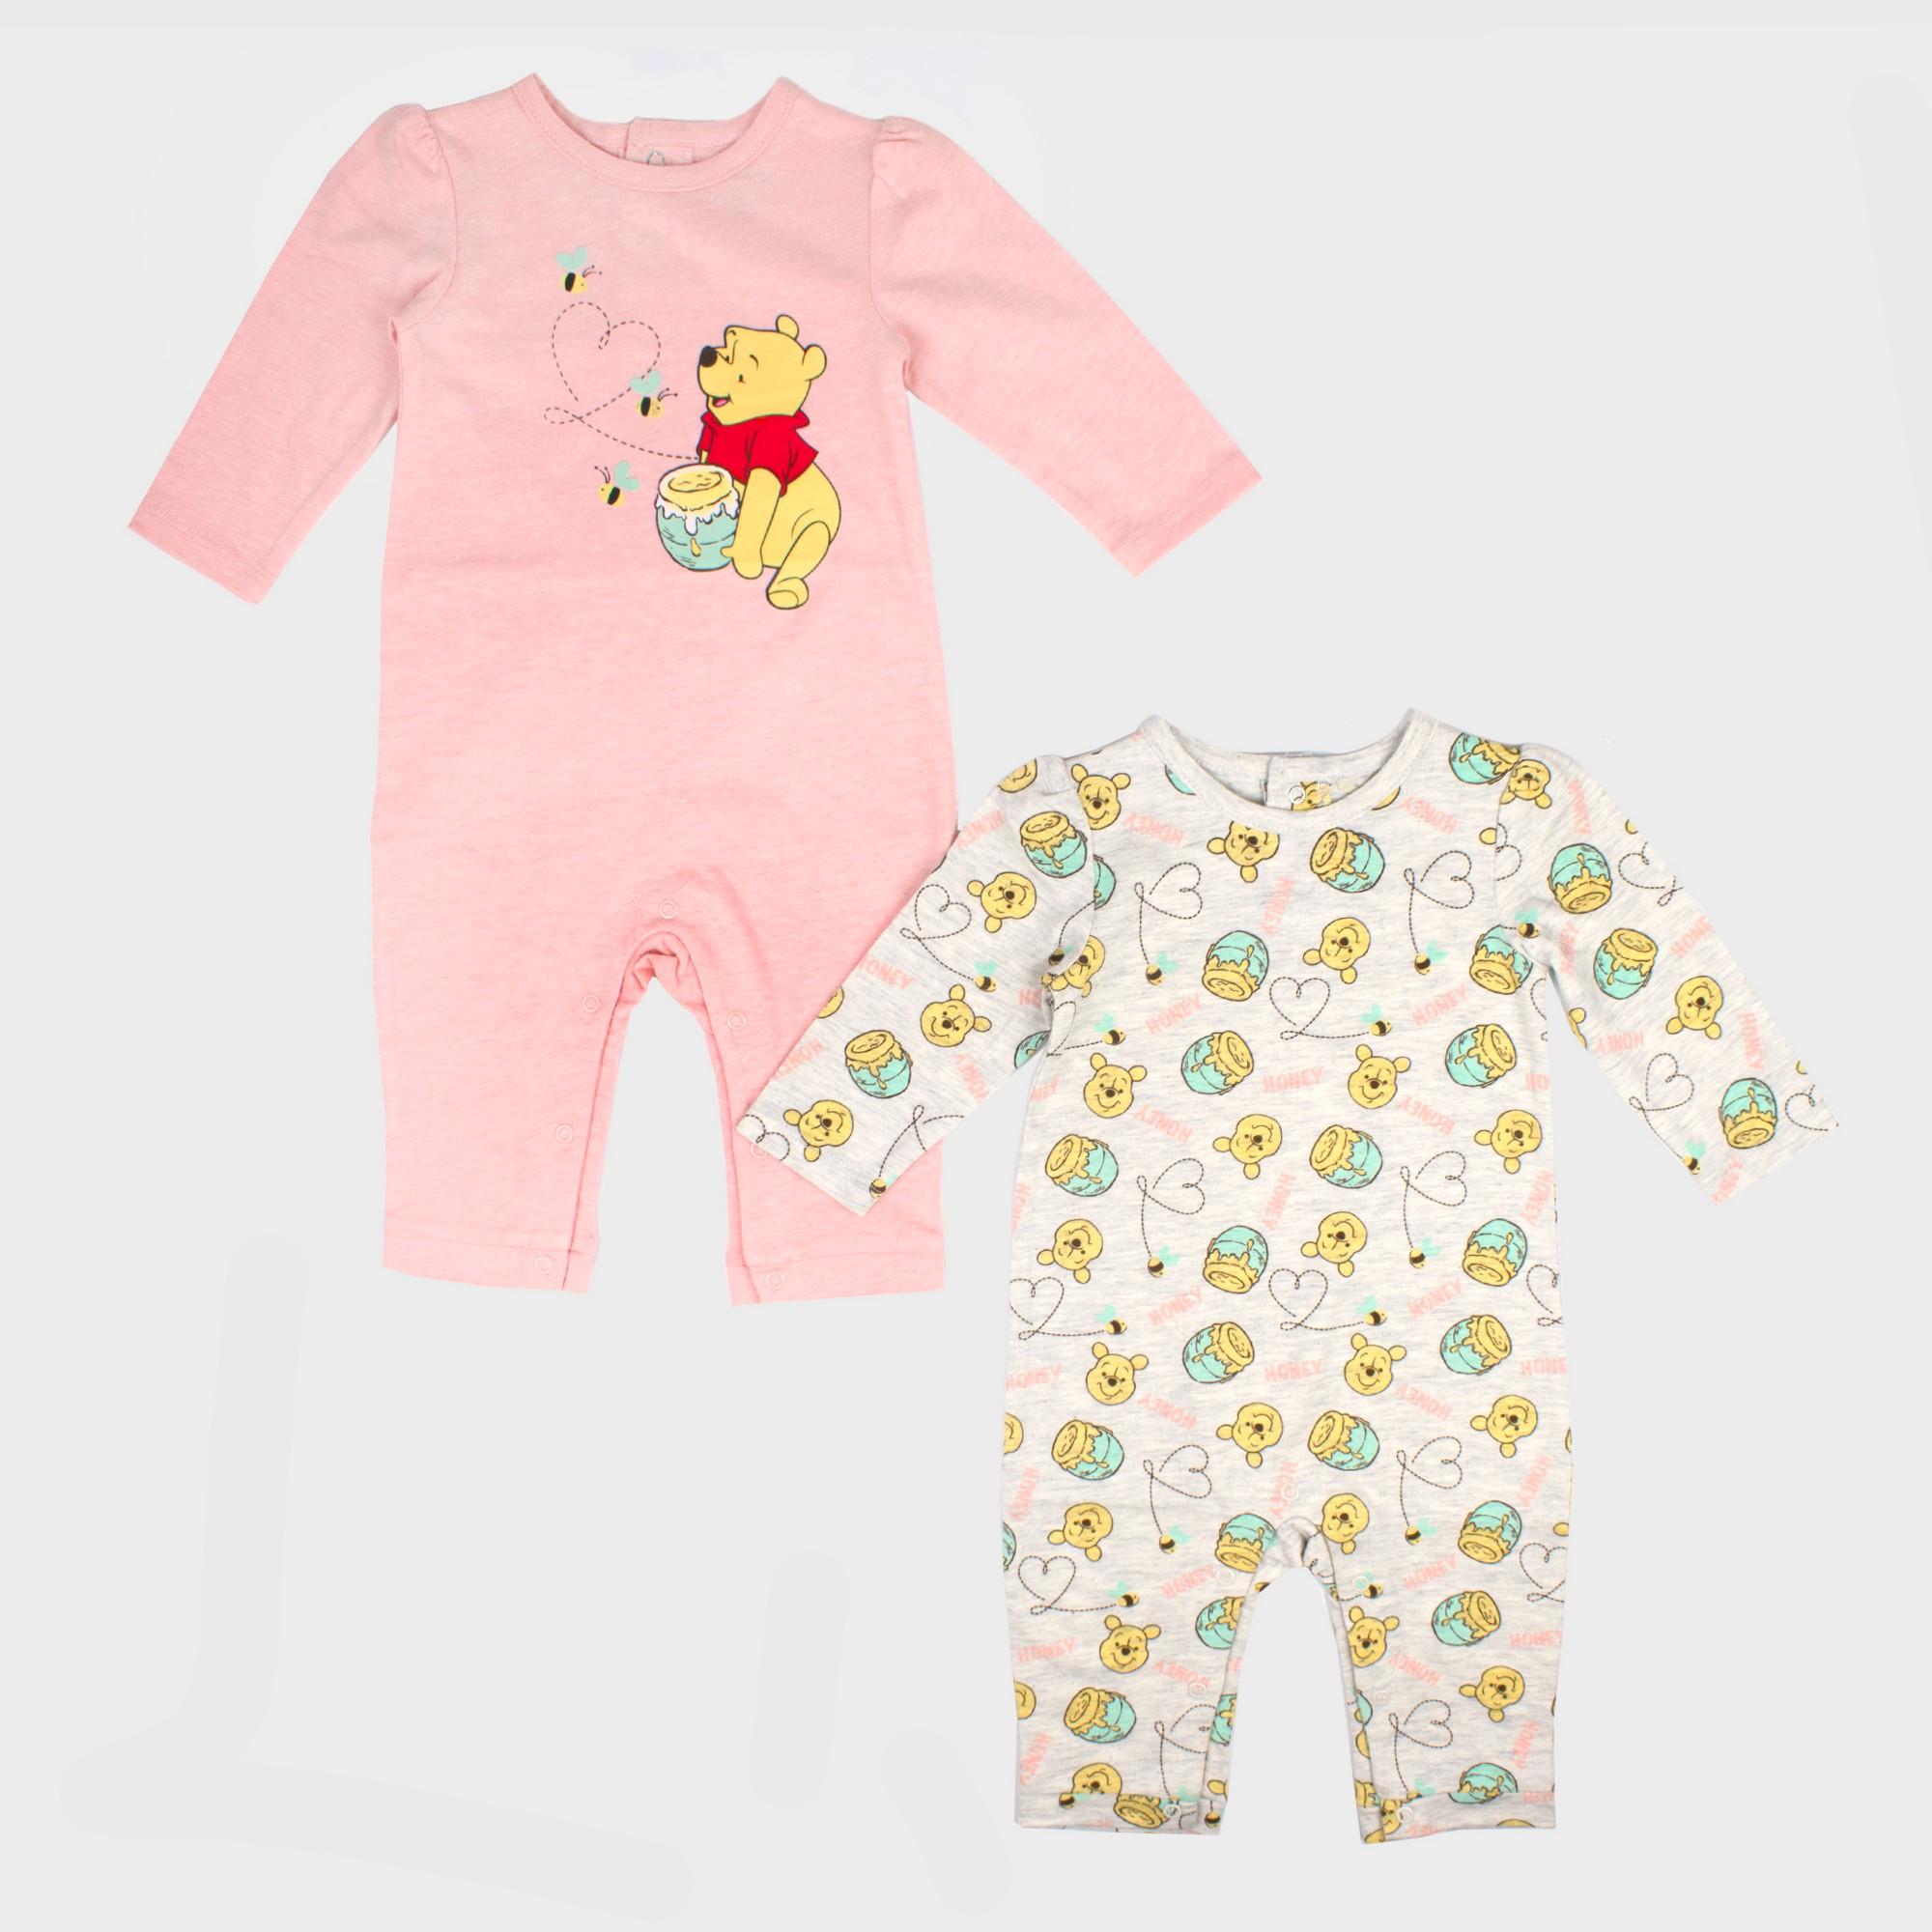 Baby Girls' 2pk Disney Winnie the Pooh Long Sleeve Romper Set - Pink/White 24M, Girl's, Orange